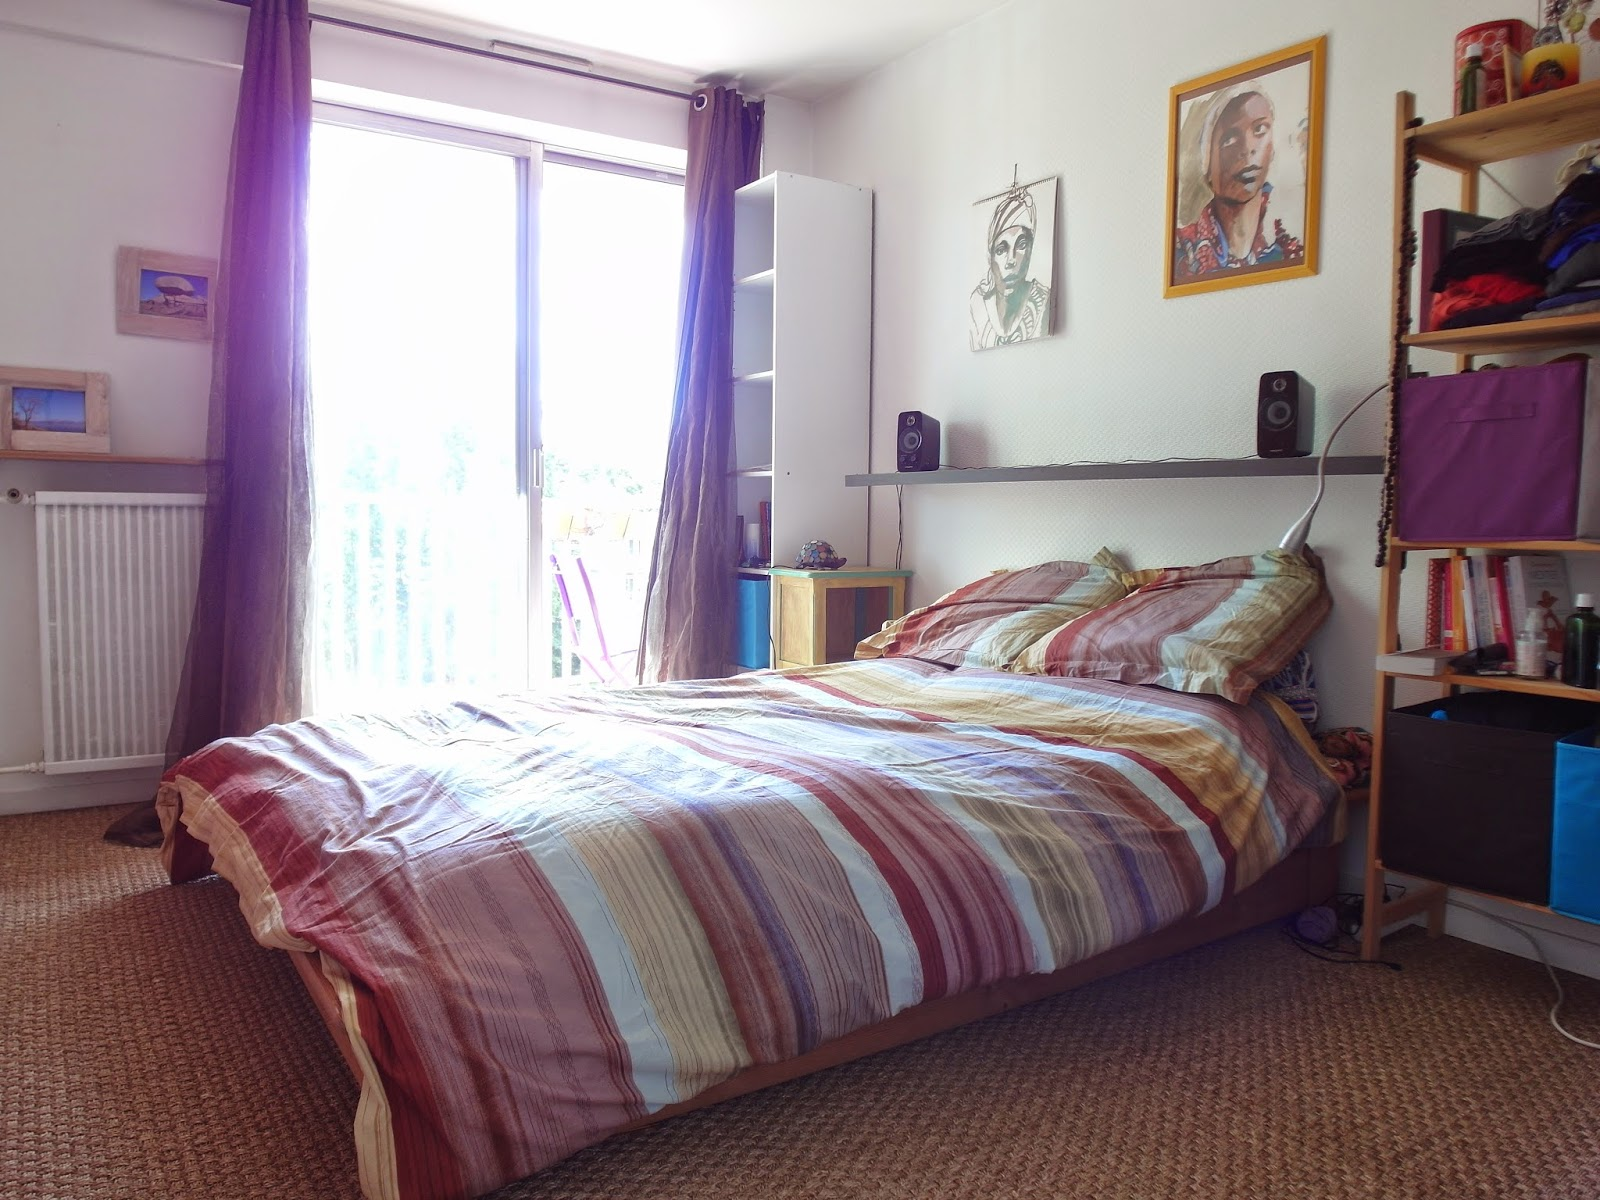 incroyable pose jonc de mer chambre id es de design. Black Bedroom Furniture Sets. Home Design Ideas